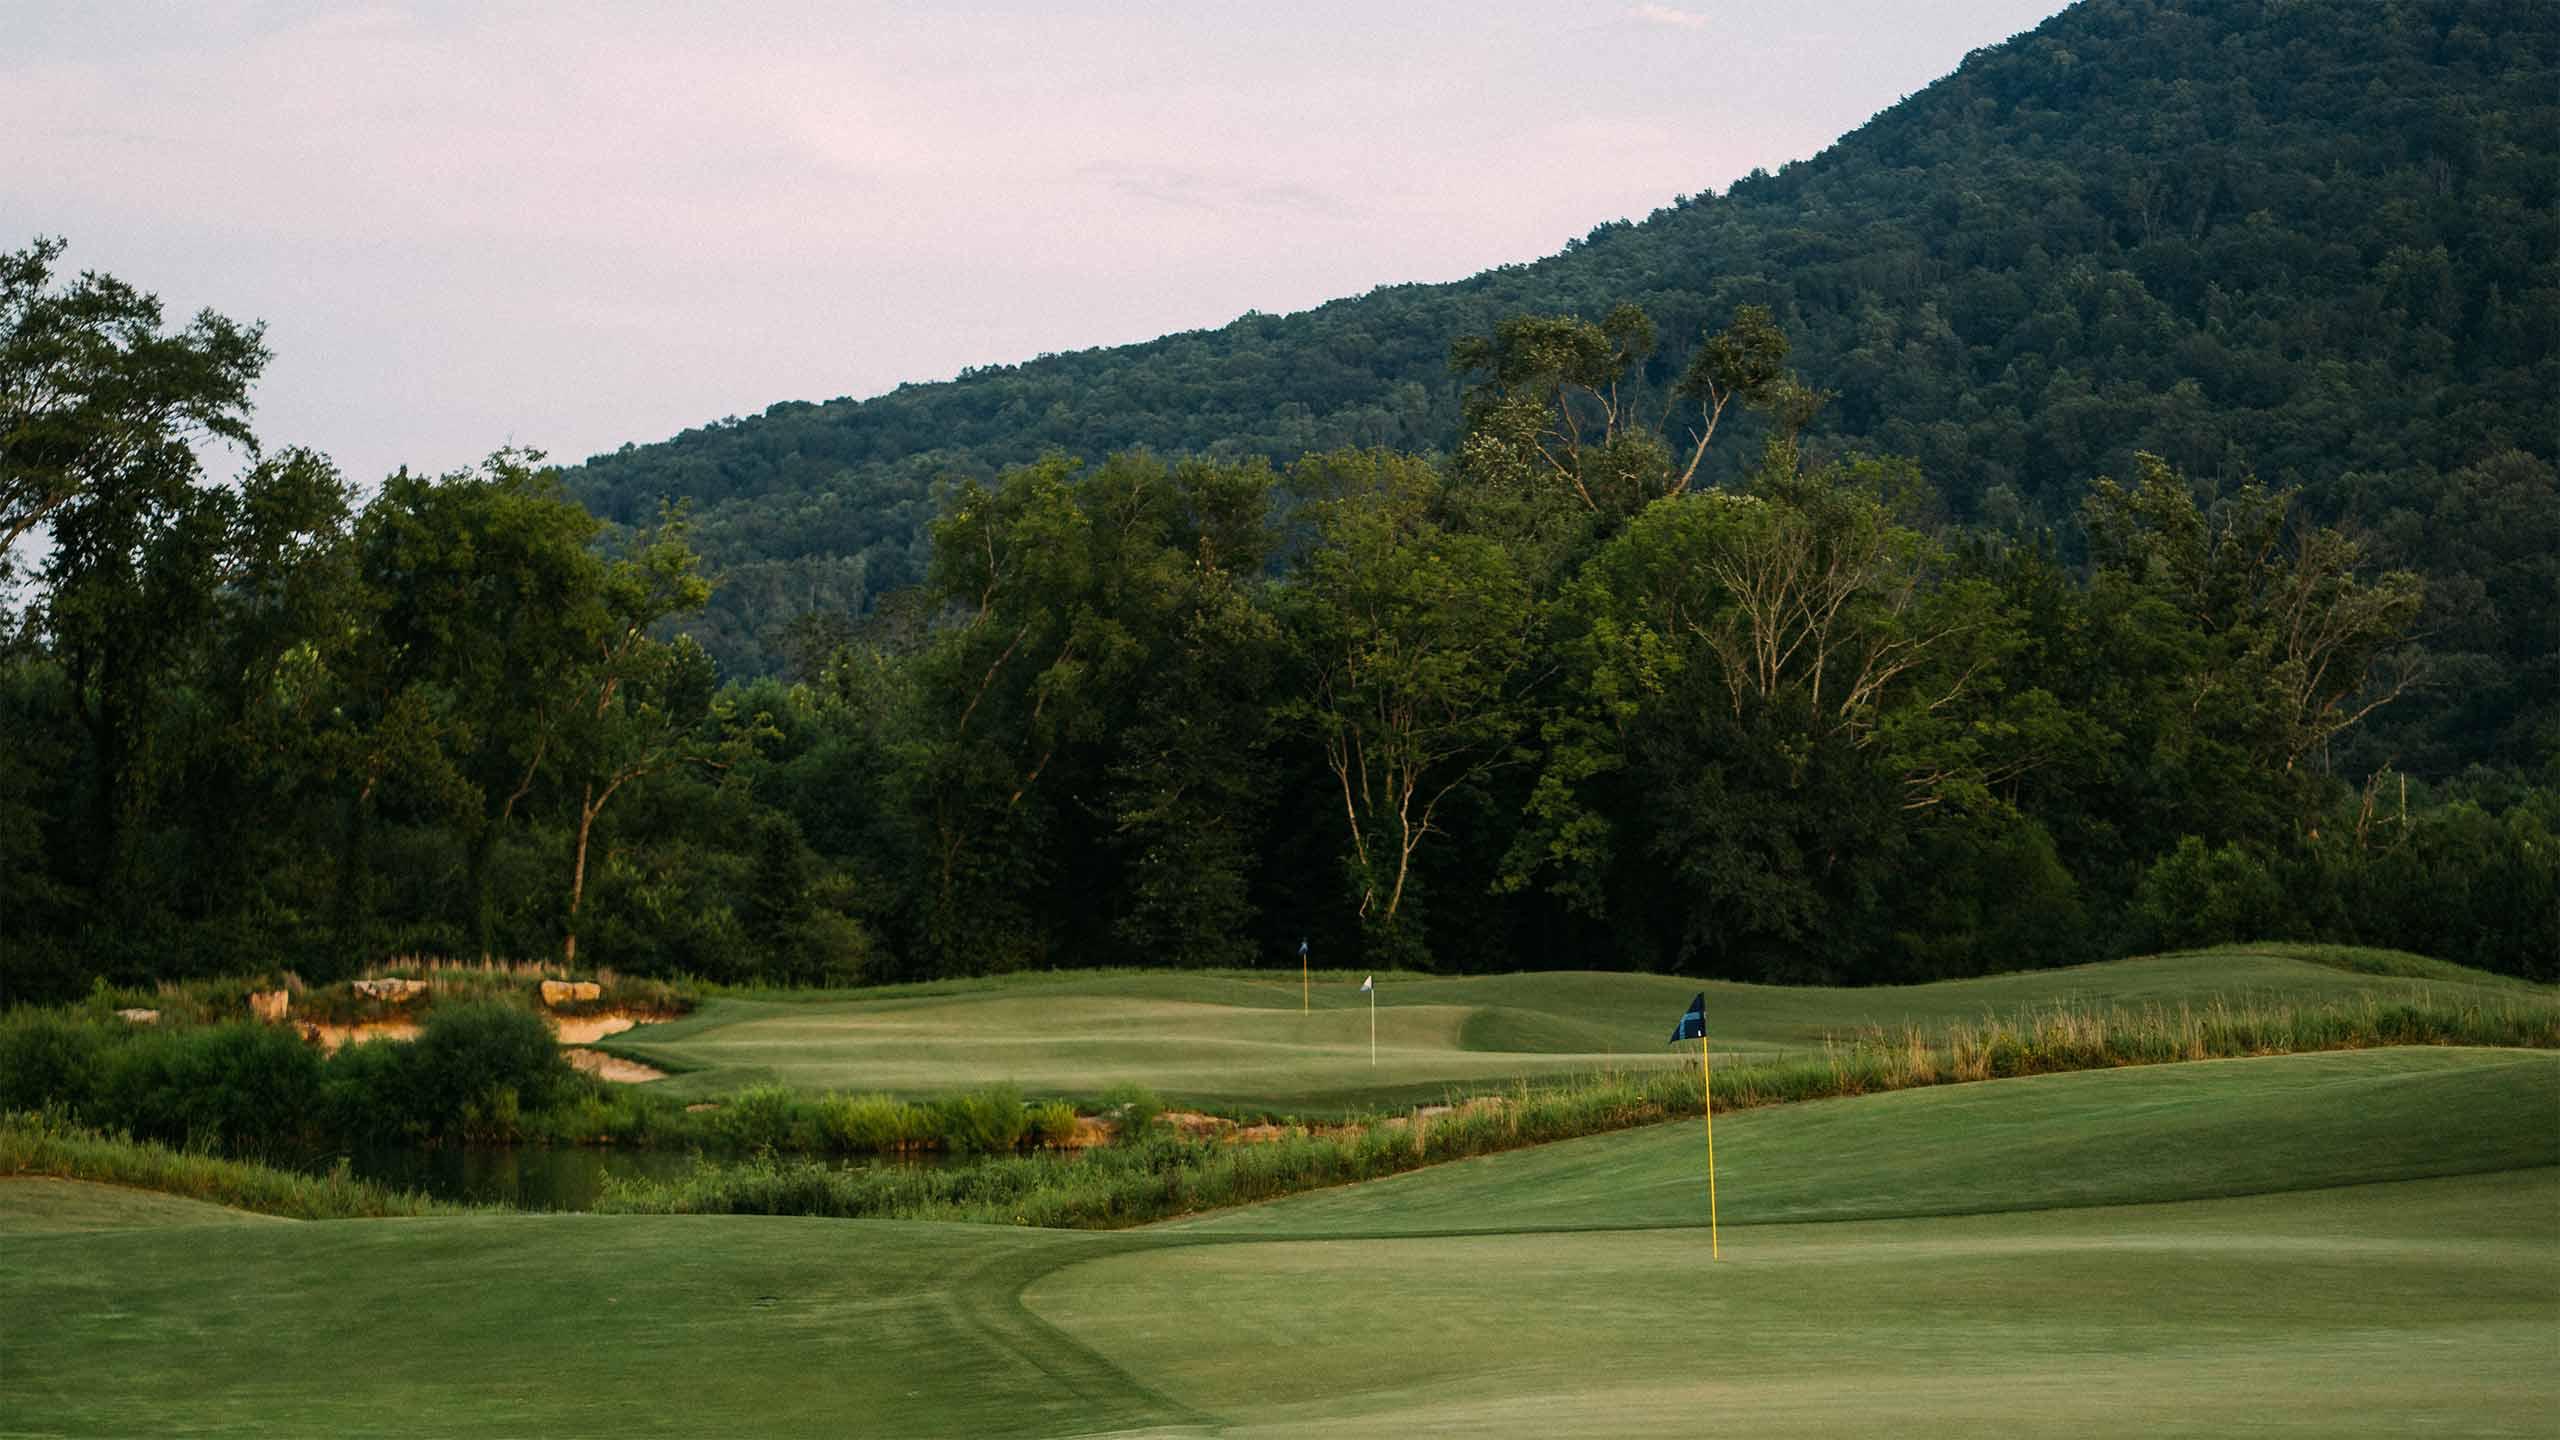 Sweetens Cove Golf Club in South Pittsburg, Tenn.